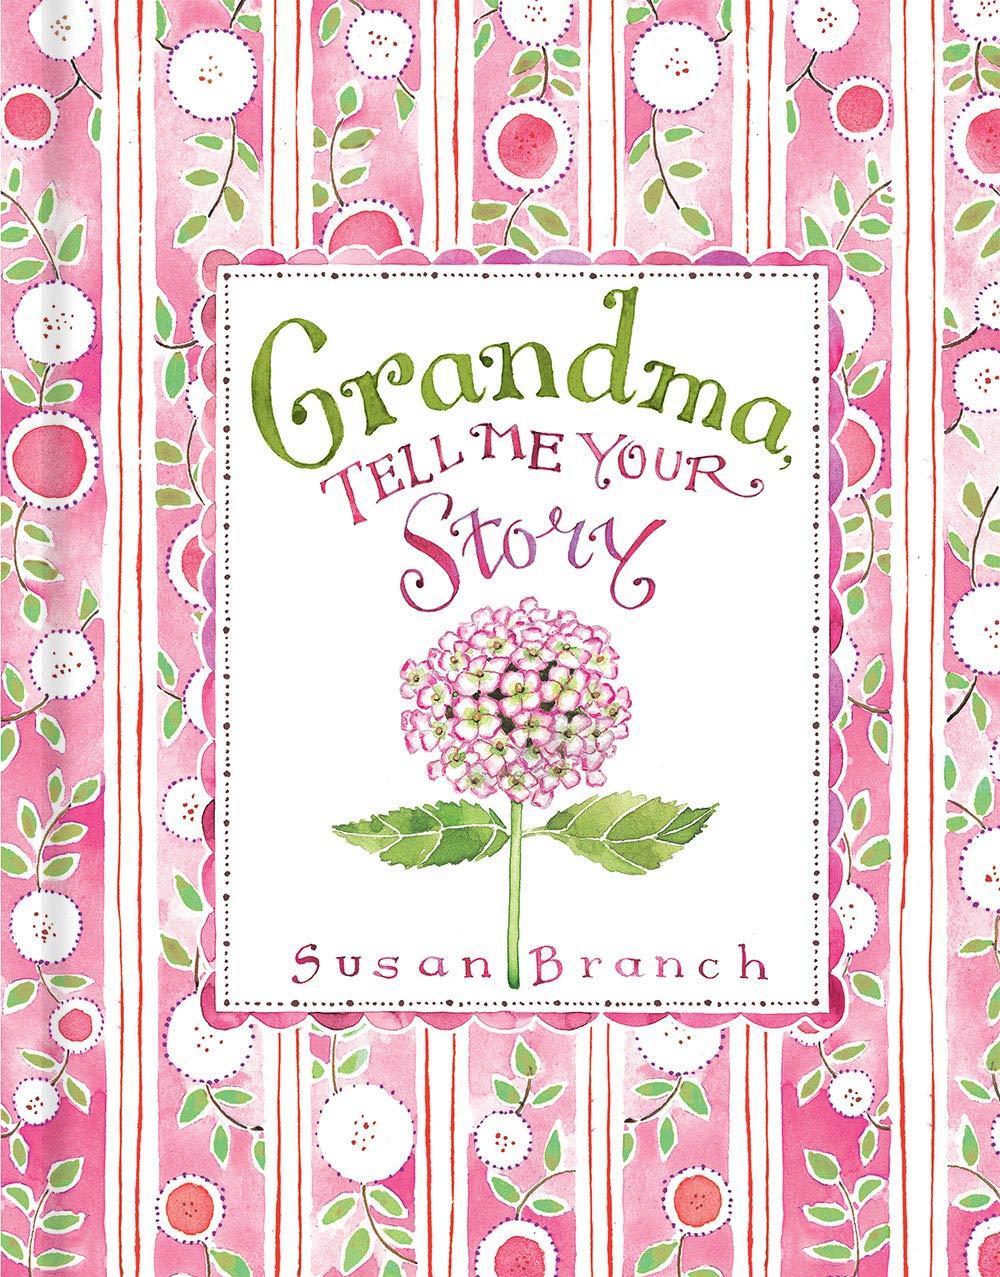 Grandma Tell Me Your Story Keepsake Journal